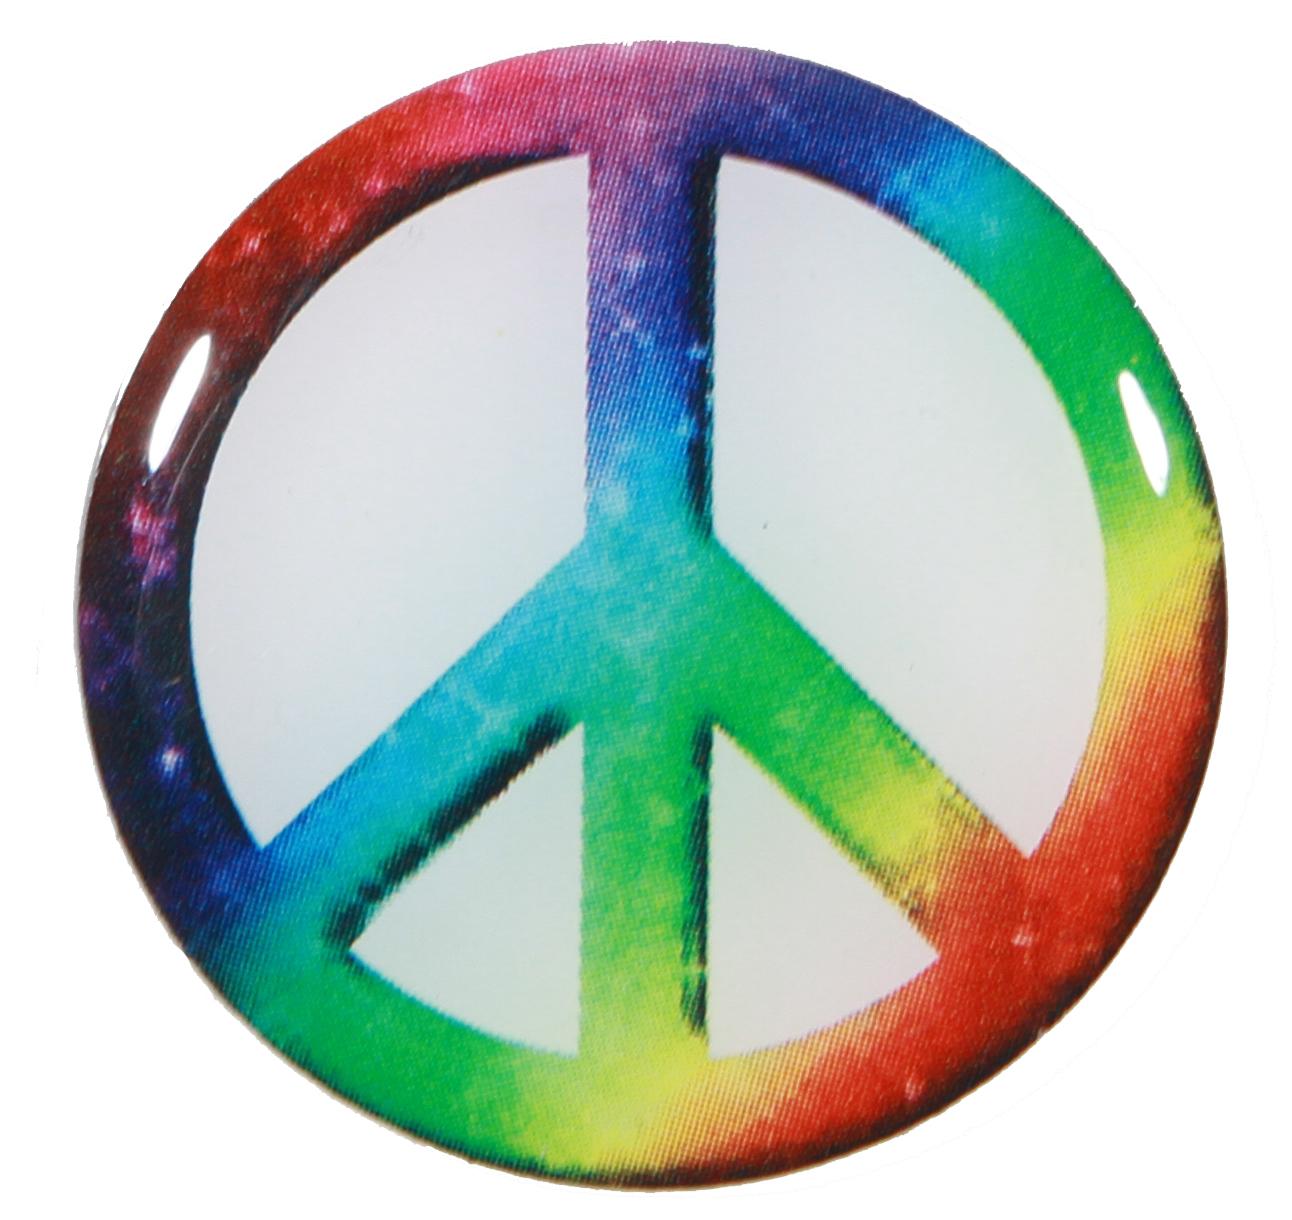 peace tie photo - 1